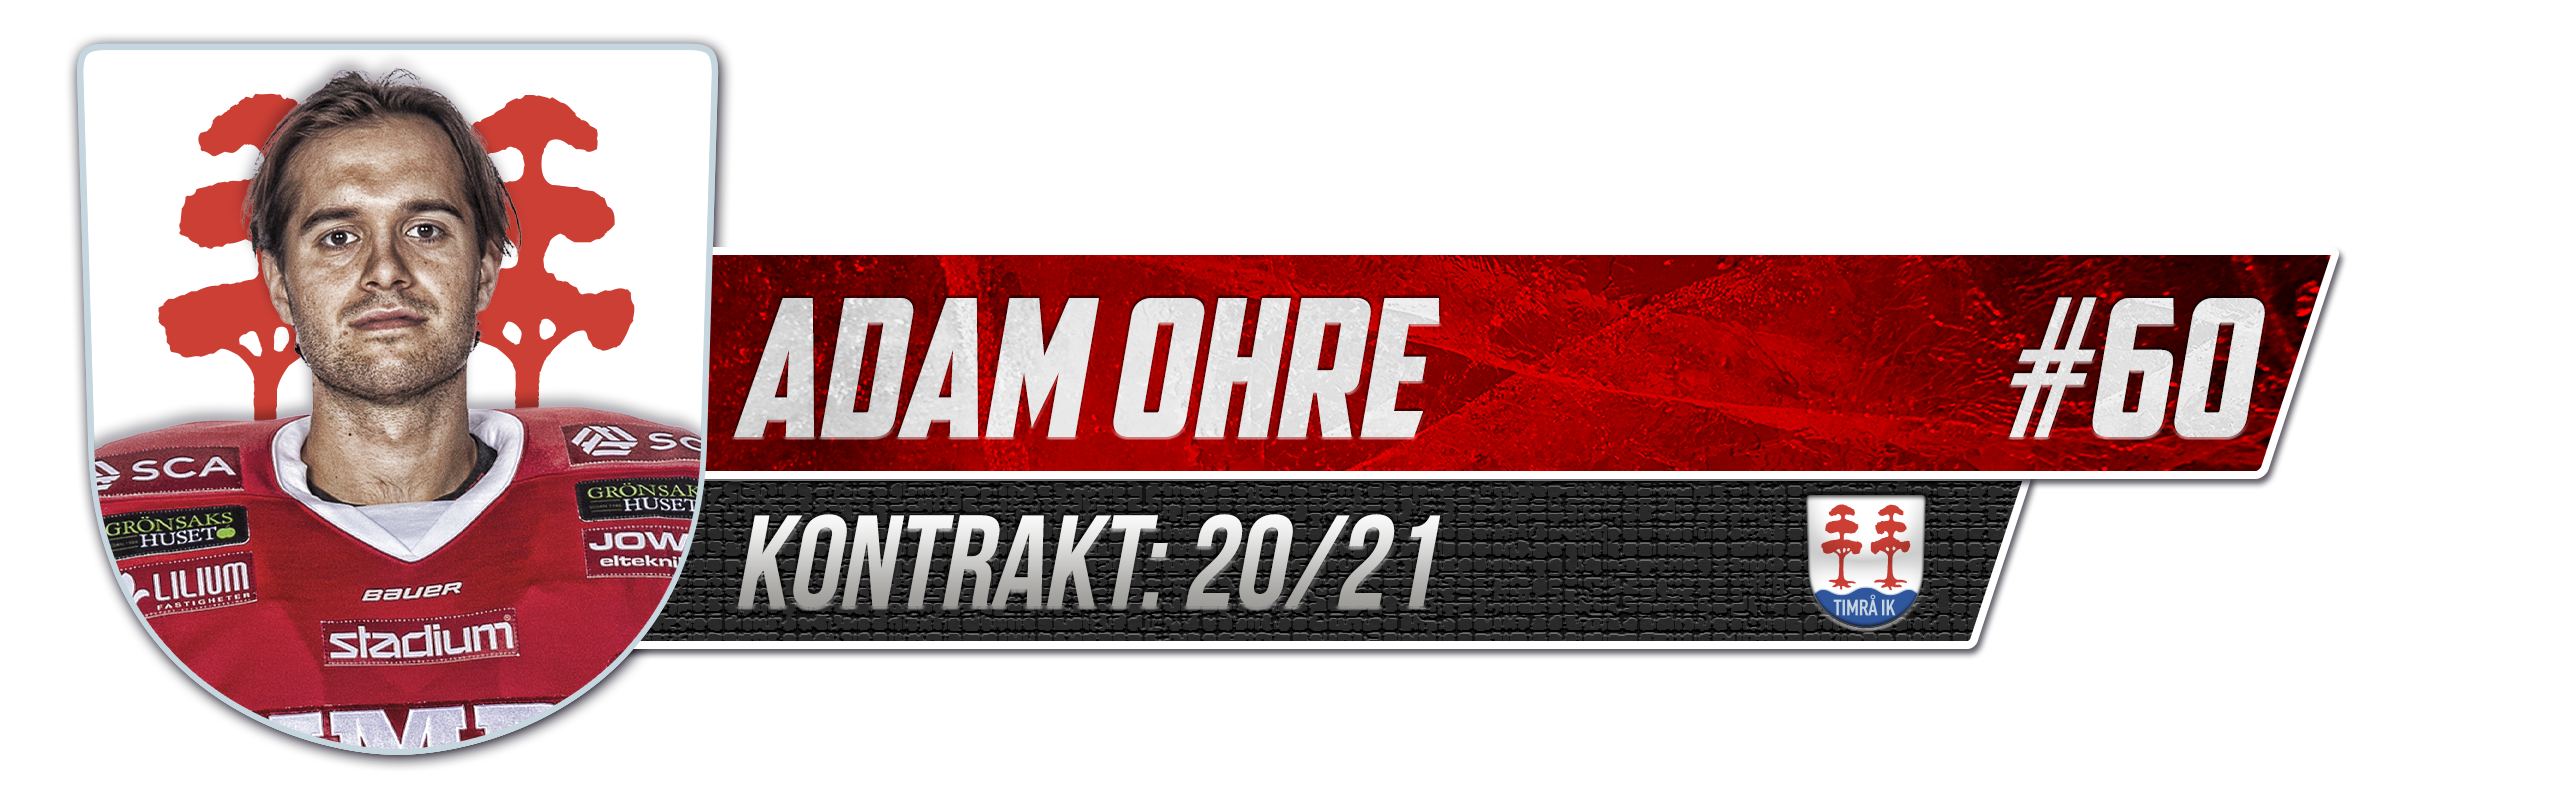 Adam Ohre